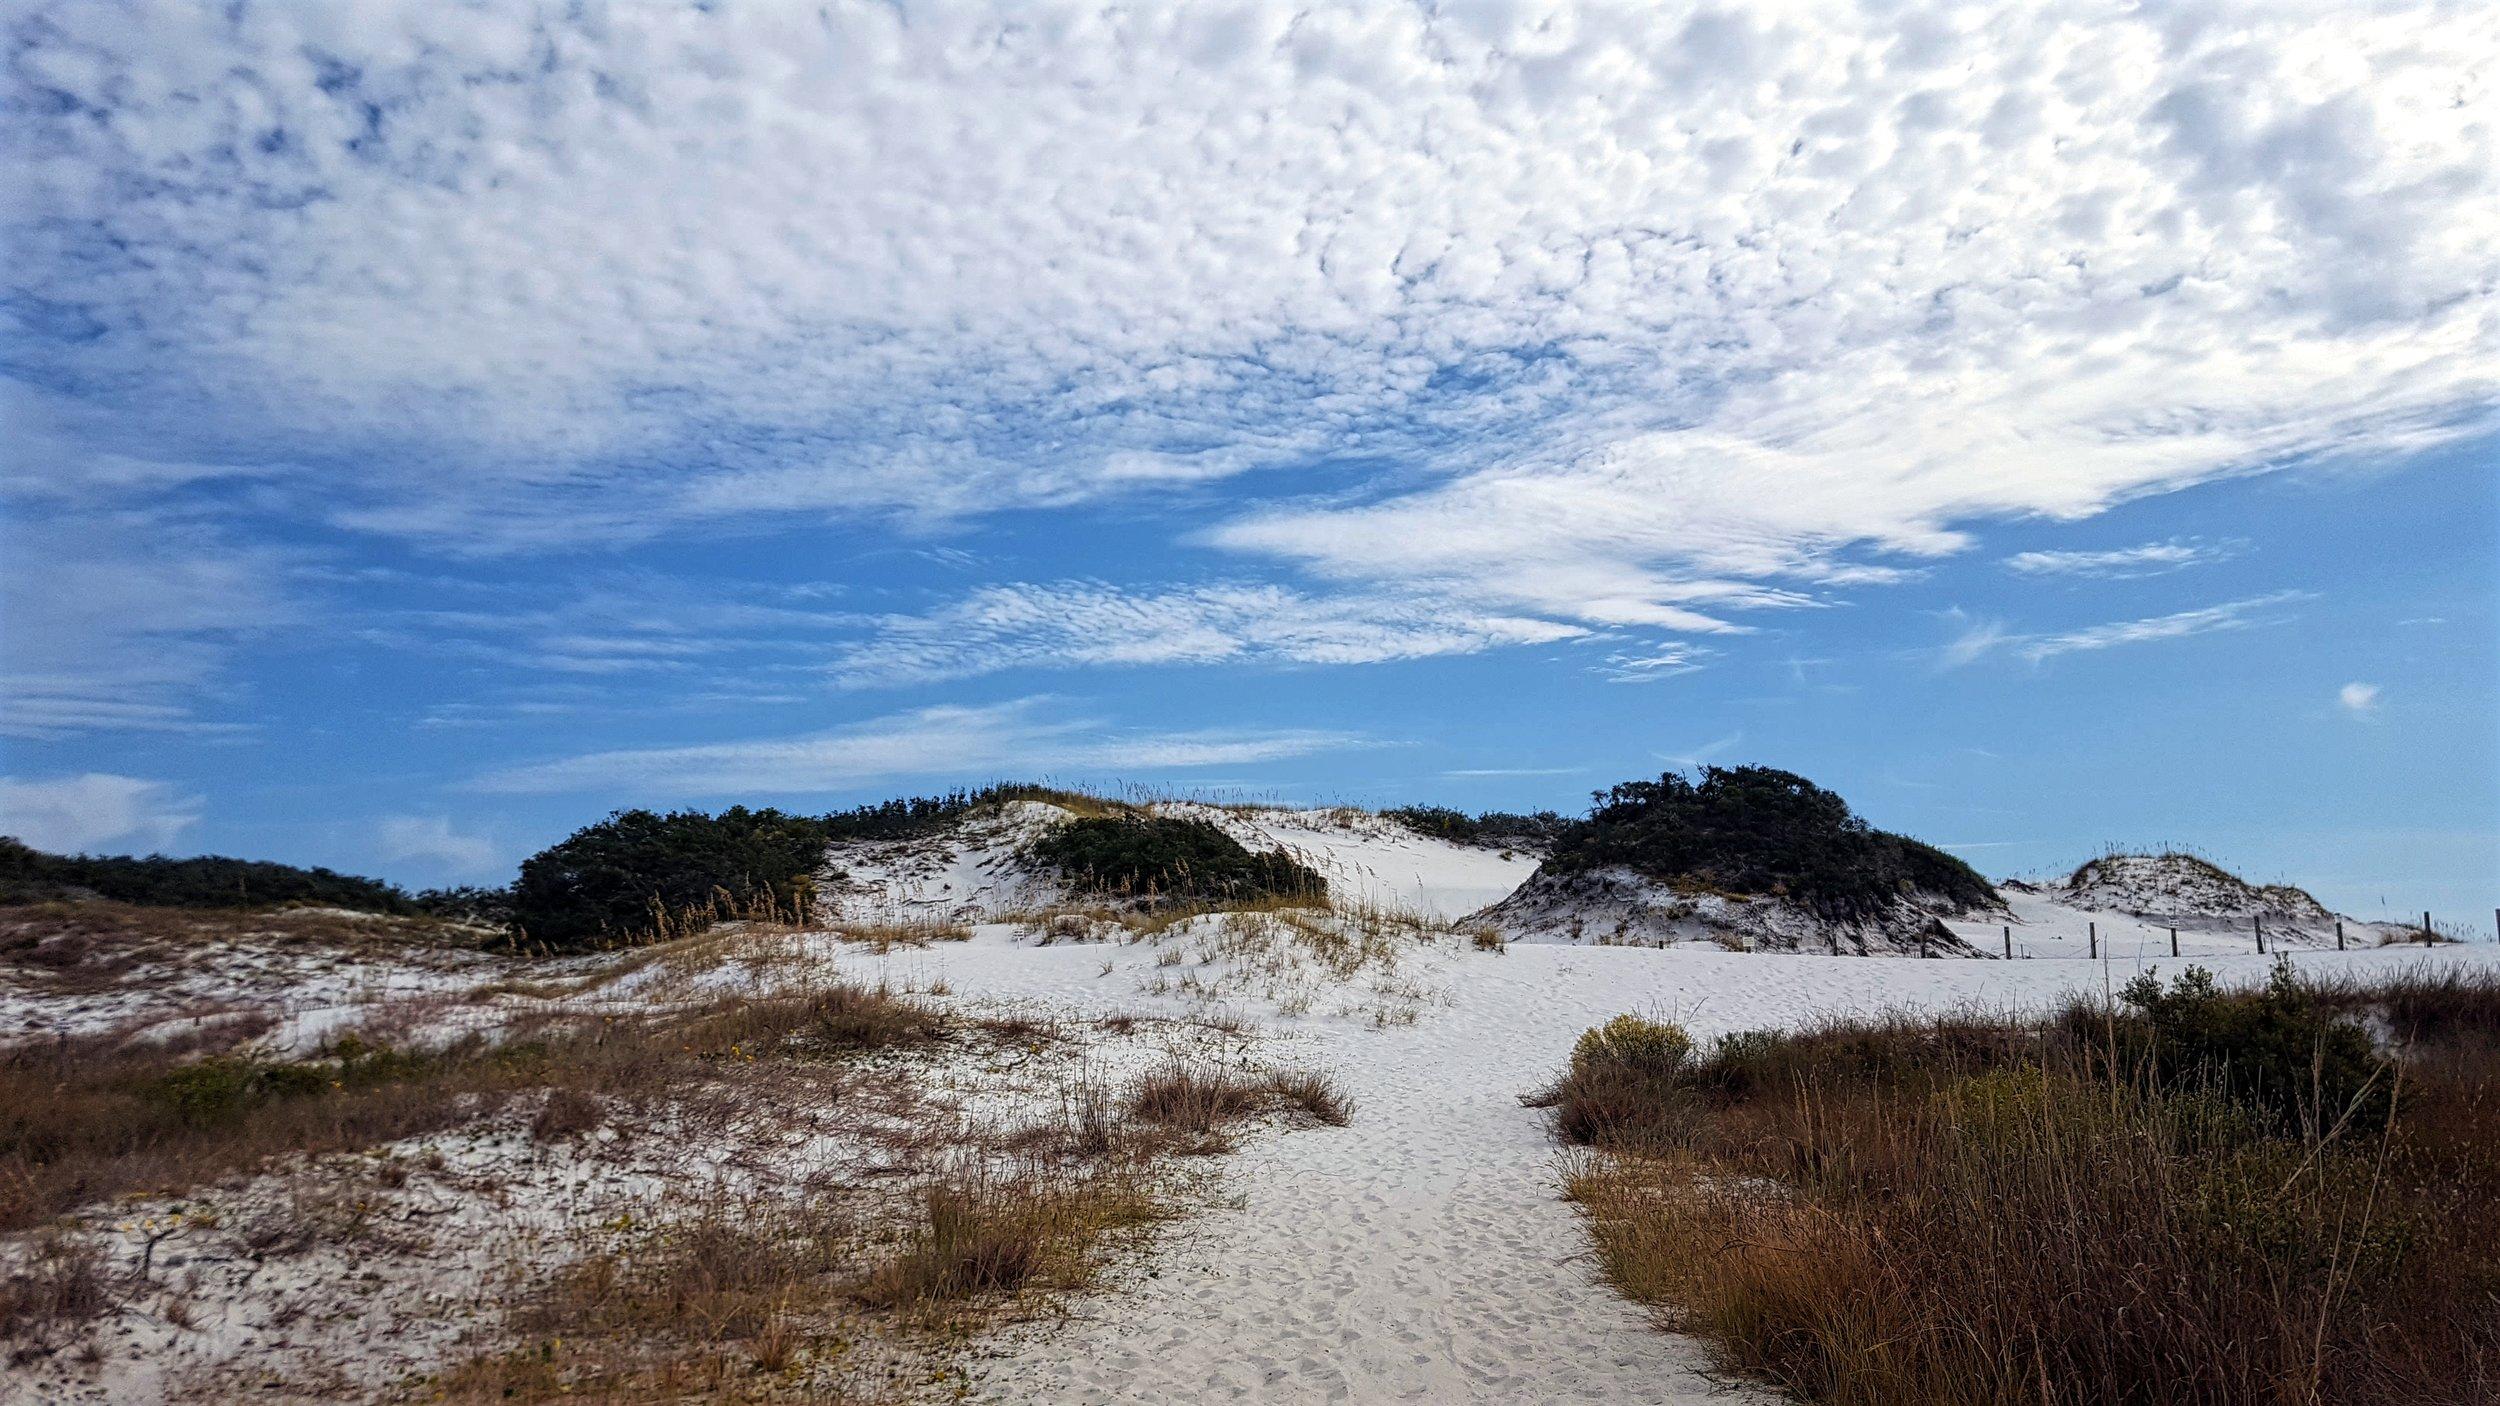 Okaloosa Island Dunes